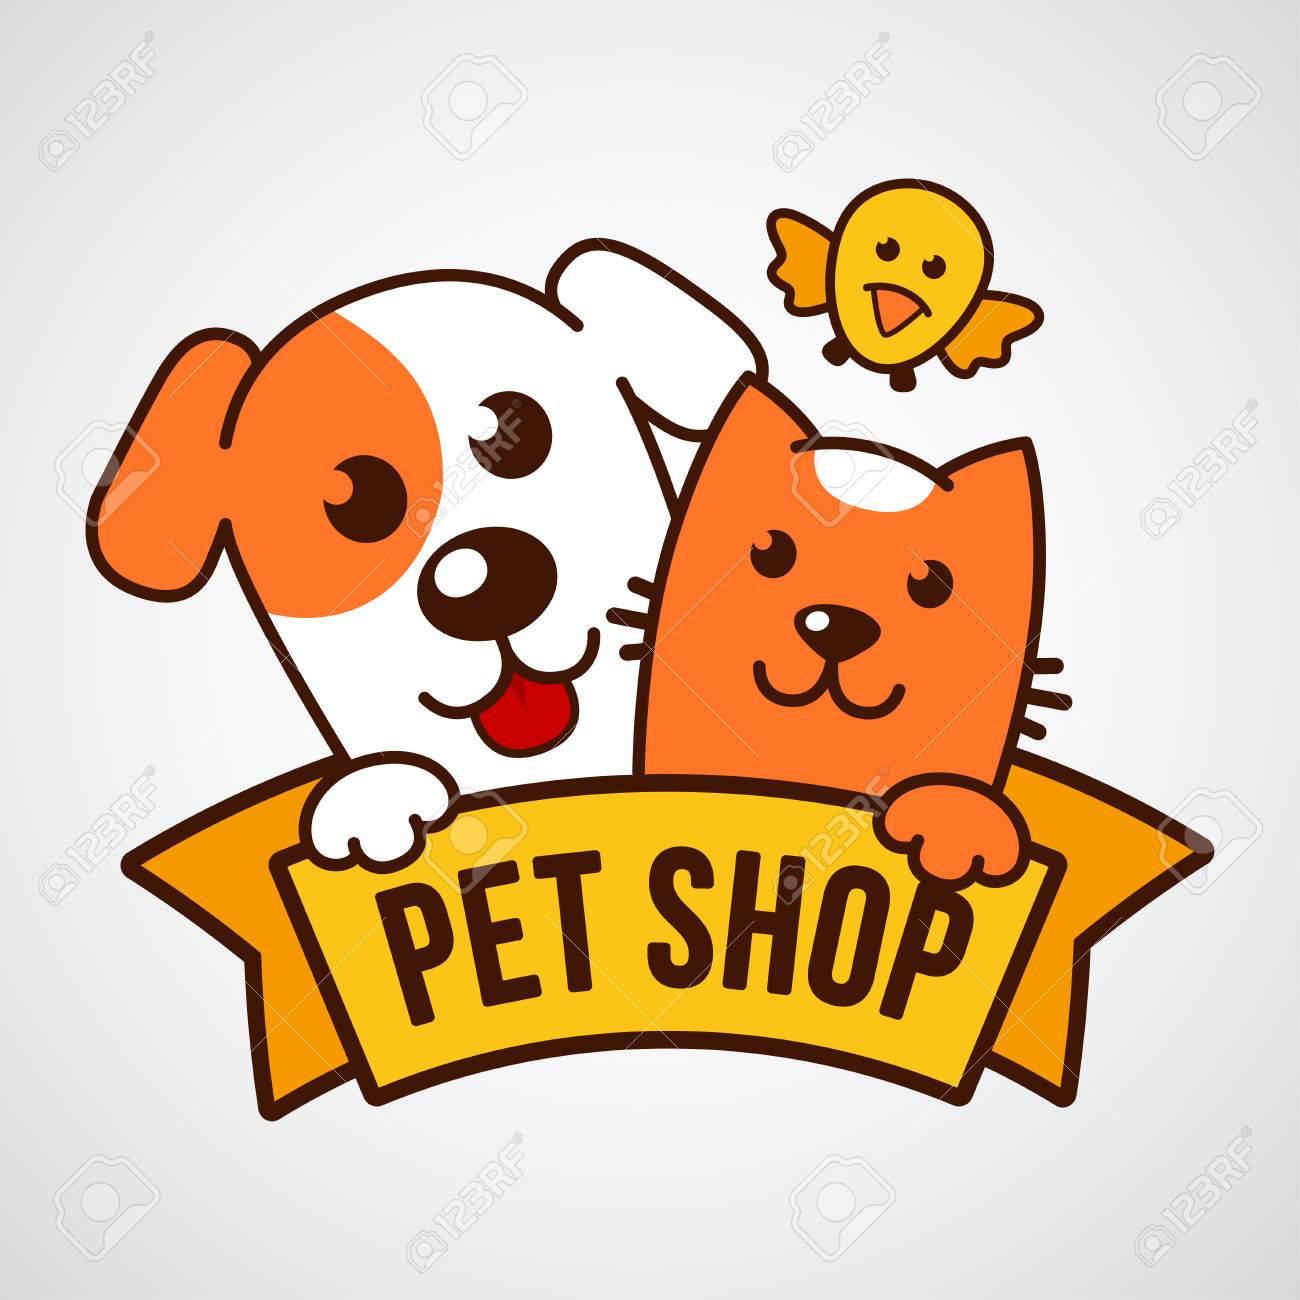 1300x1300 Vector Logo Design Template For Pet Shops, Veterinary Clinics